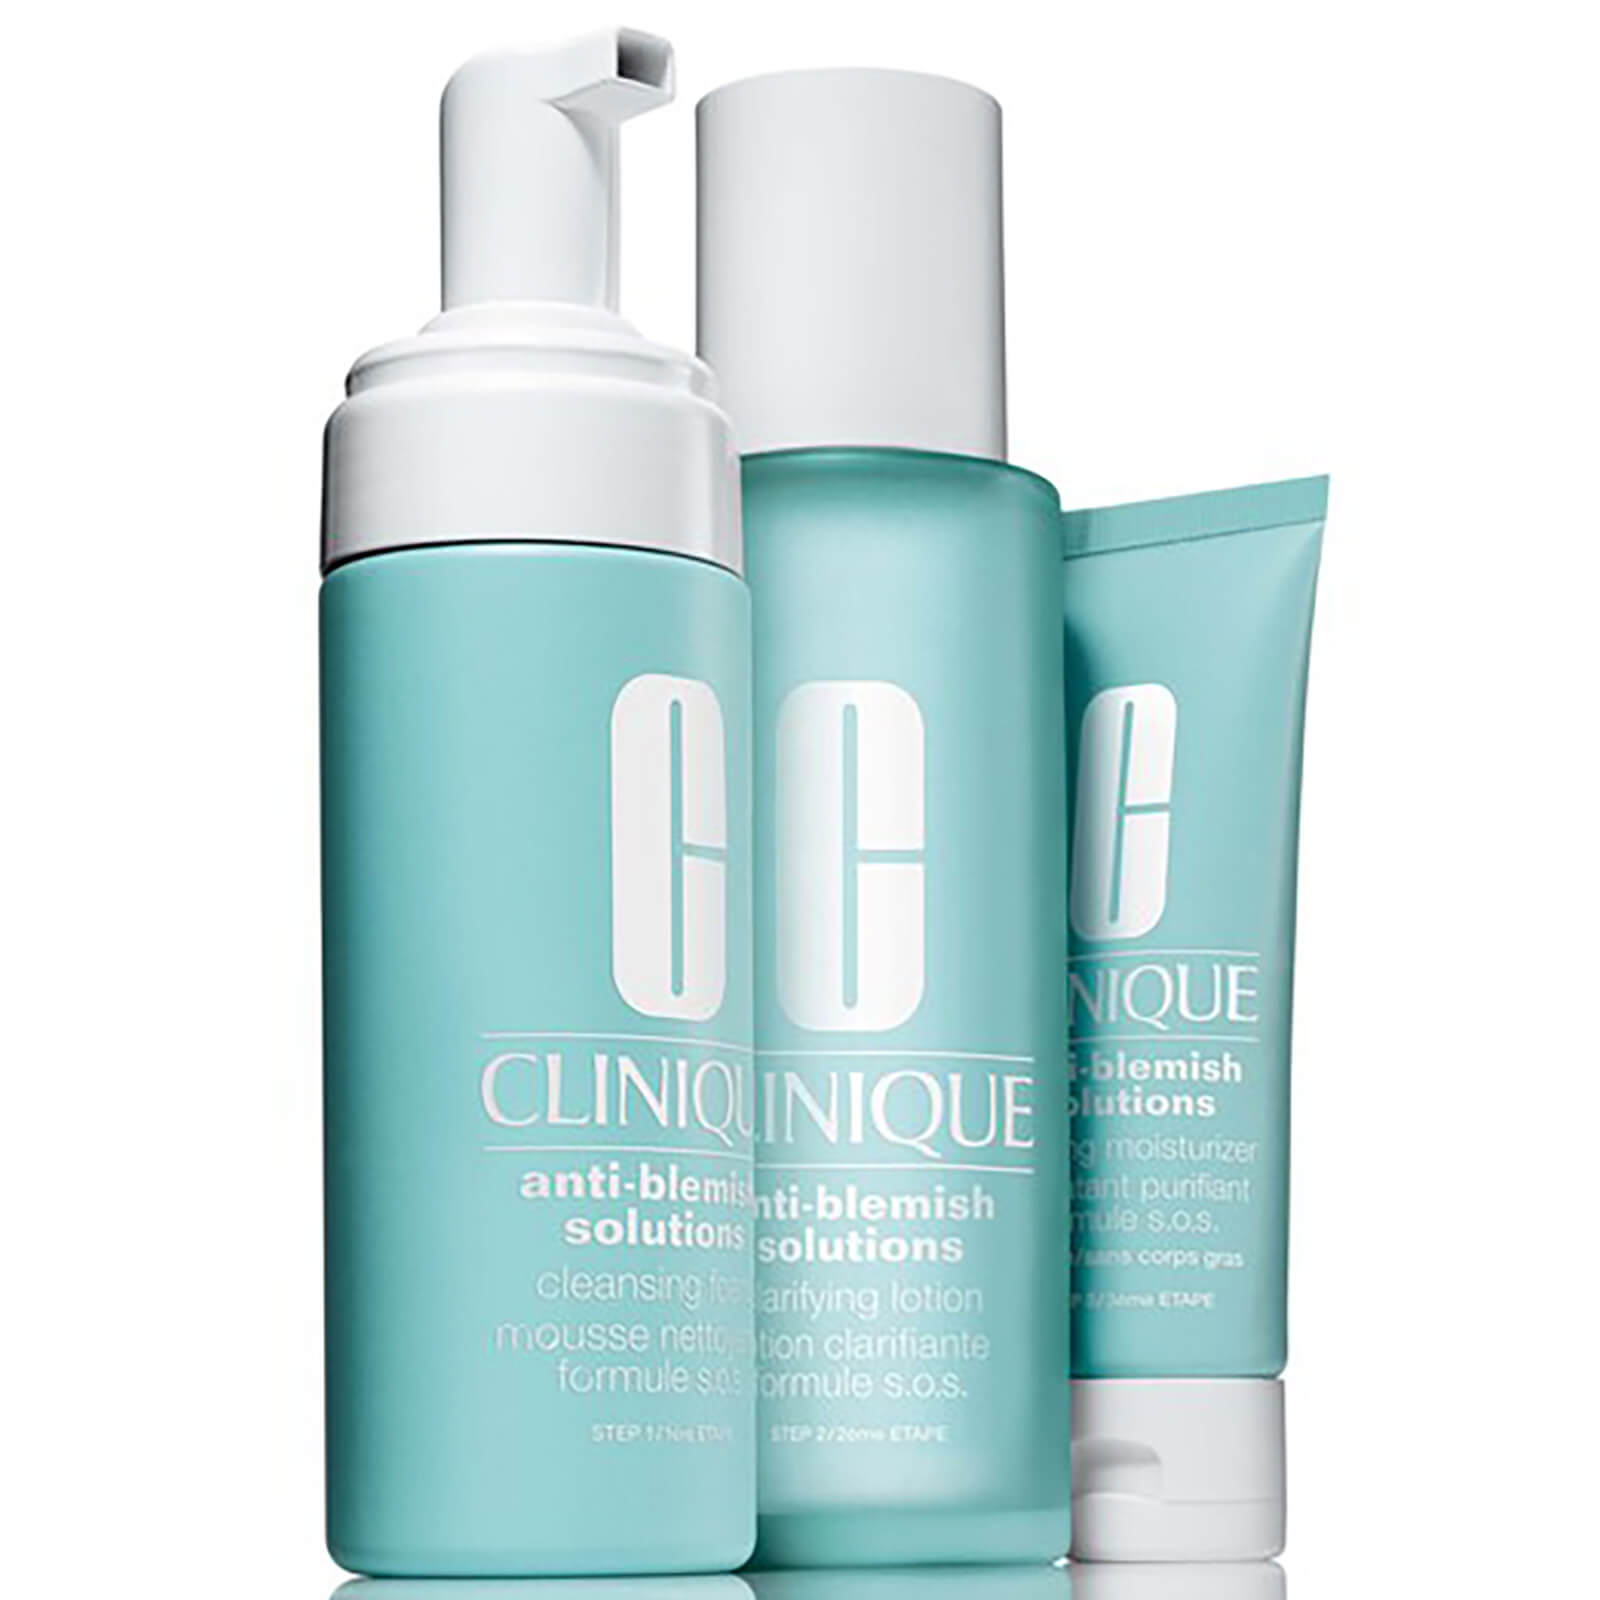 clinique anti blemish solutions